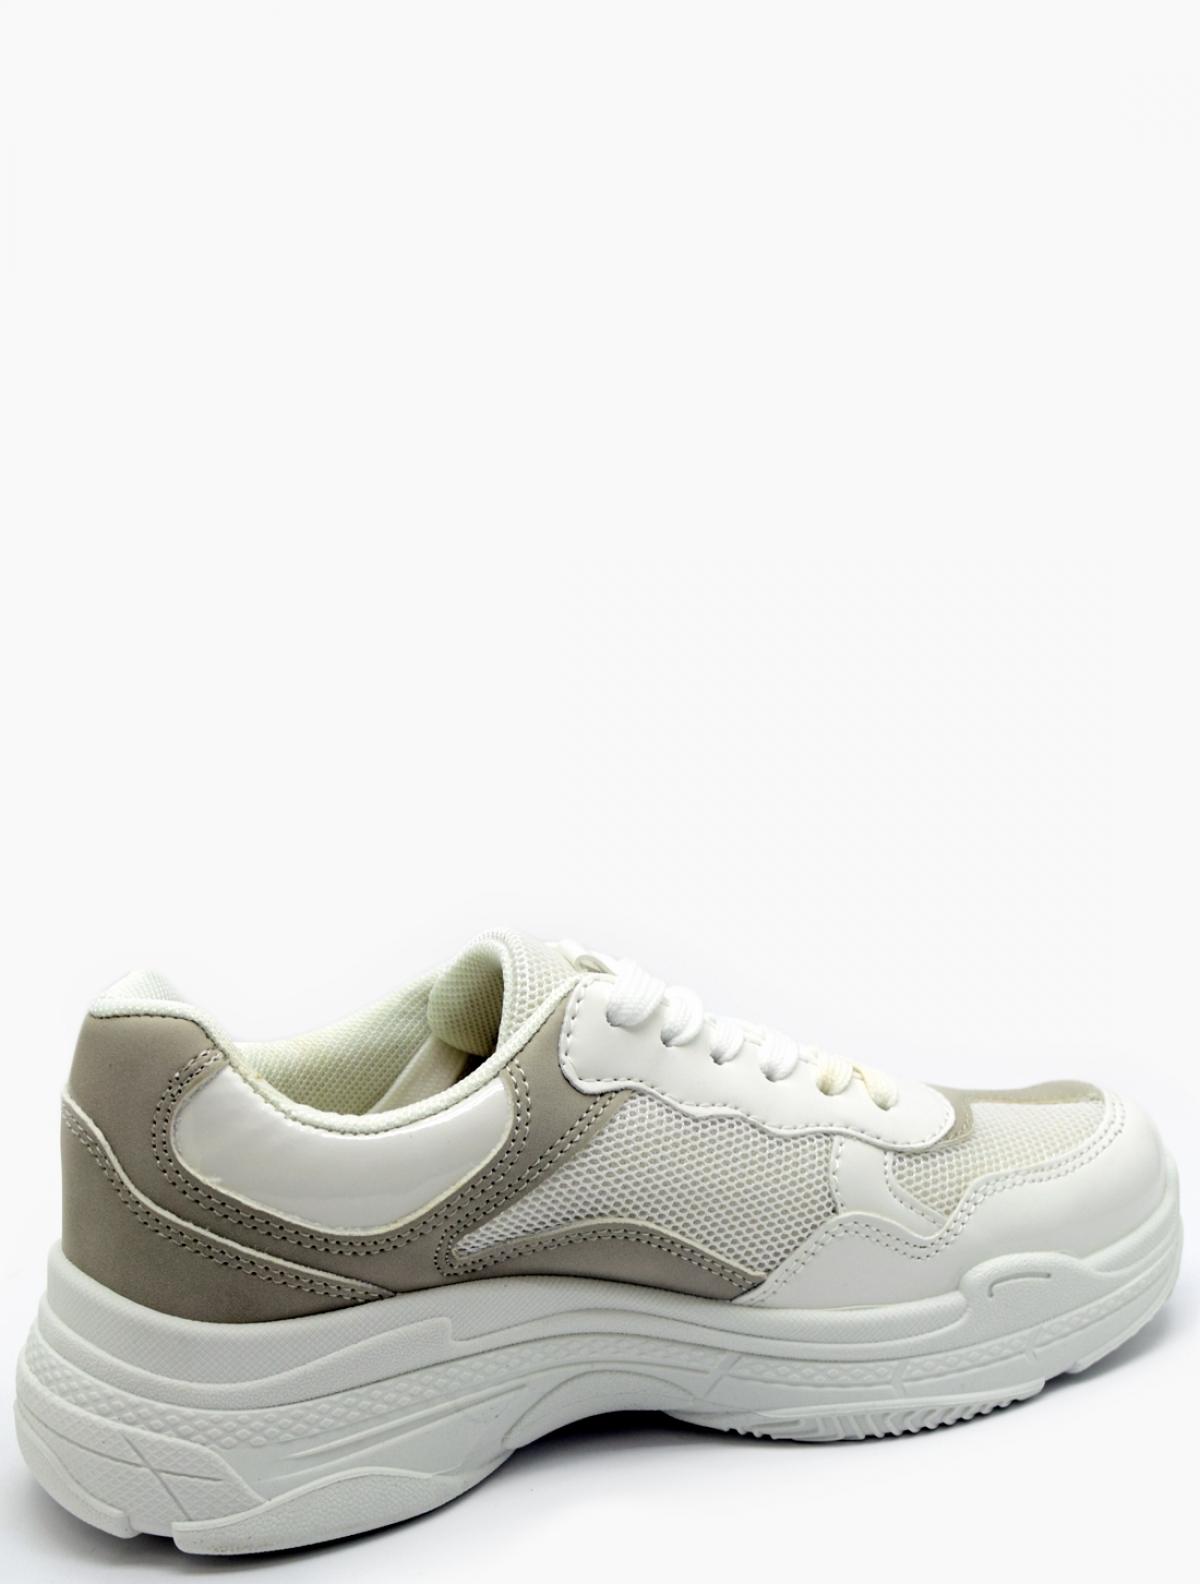 Rio Fiore KM102A женские кроссовки